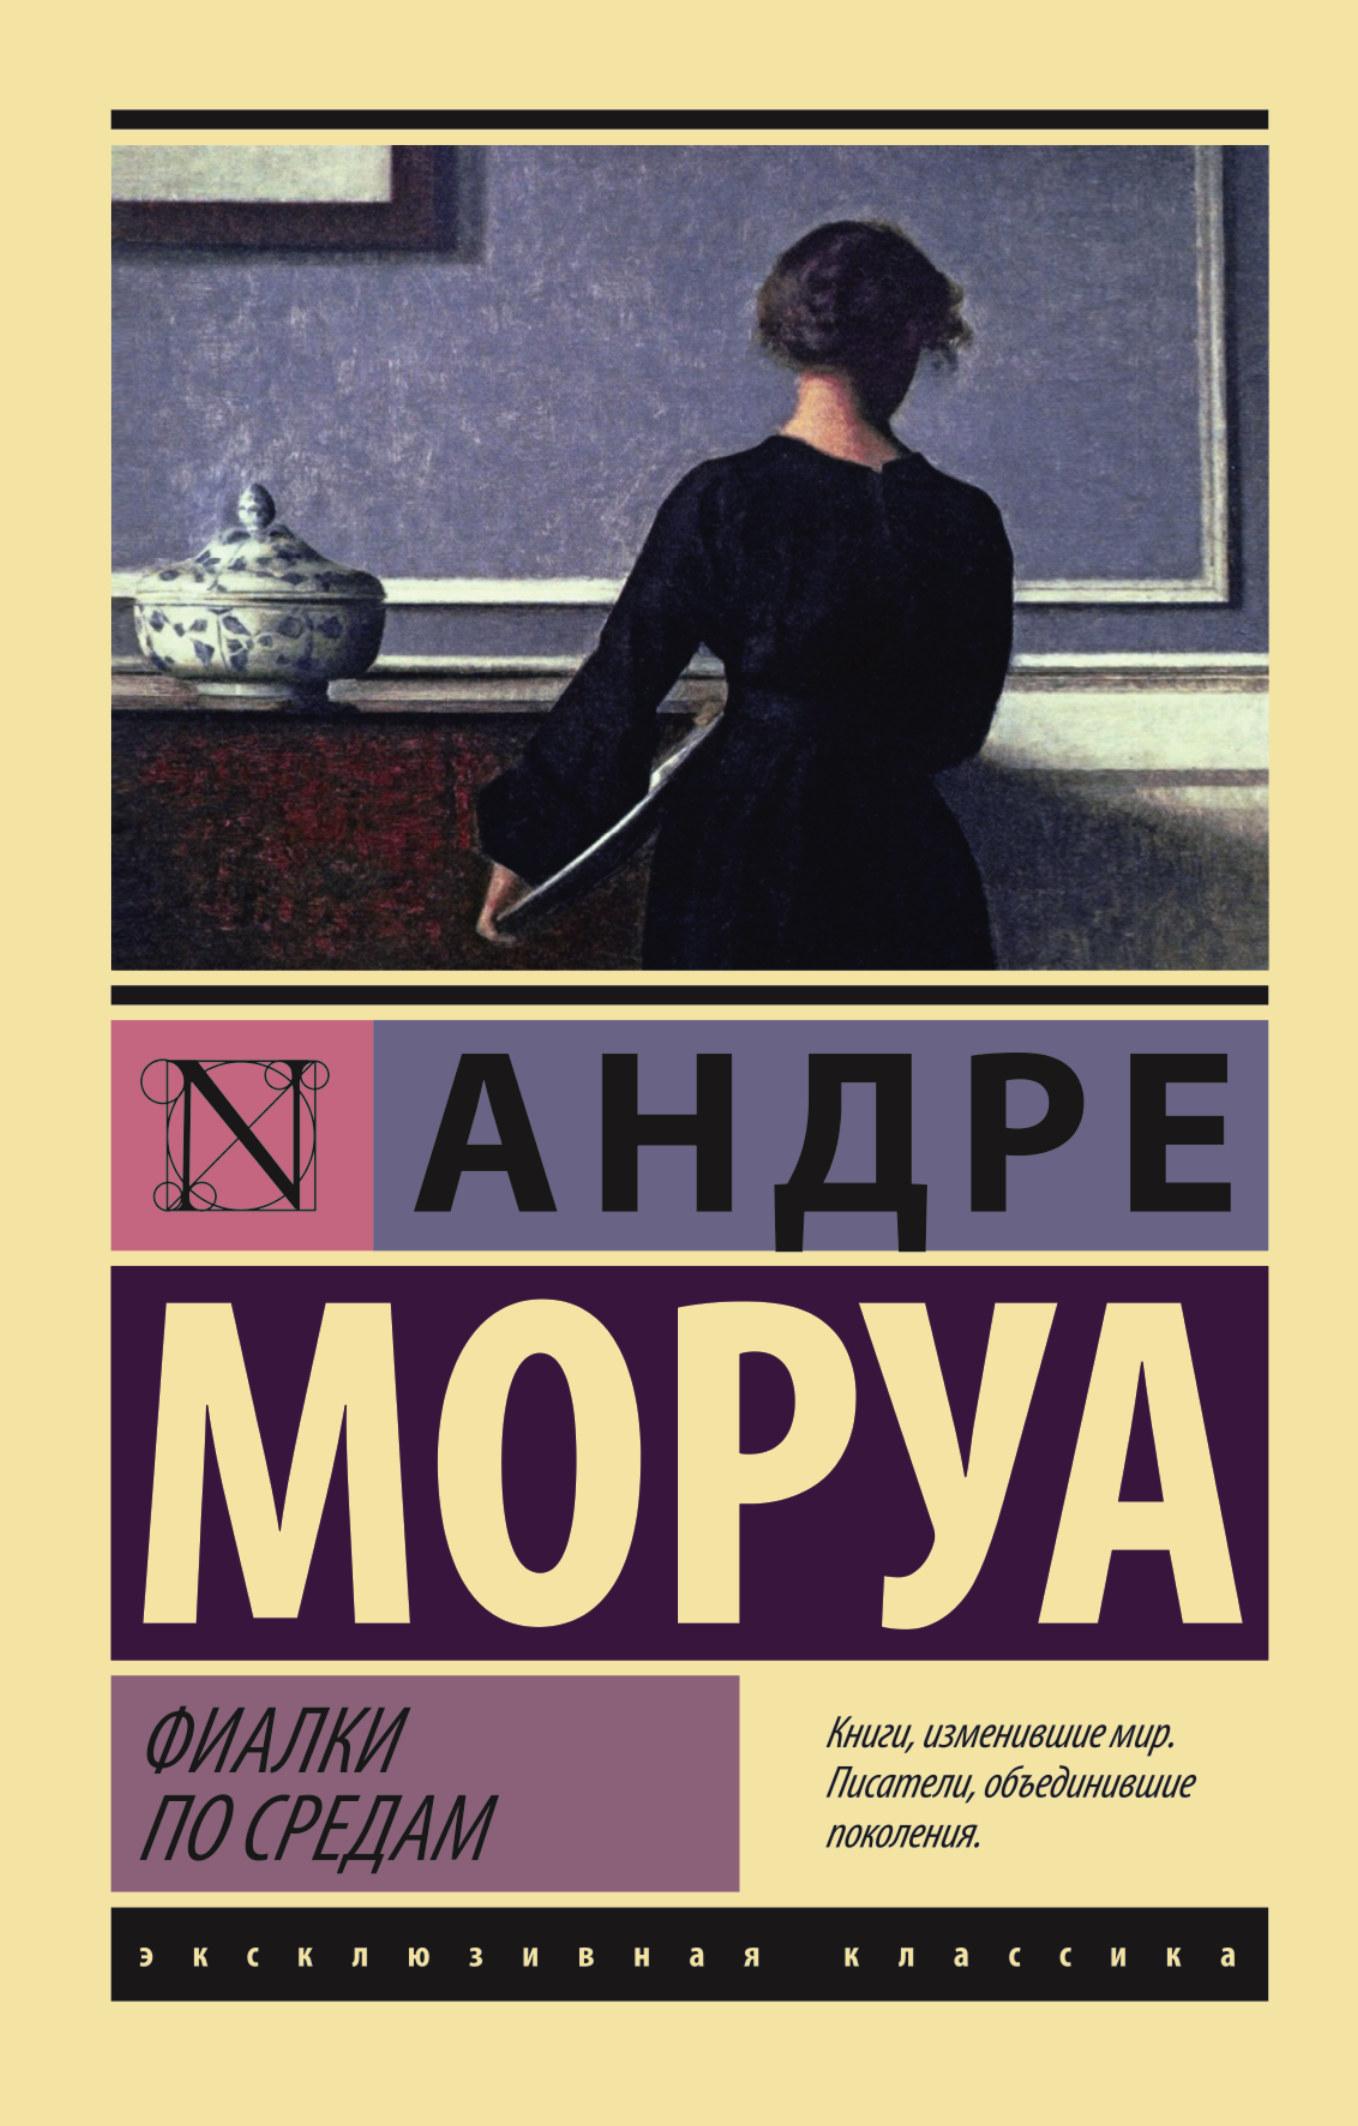 Моруа Андре Фиалки по средам андре моруа андре моруа комплект из 4 книг